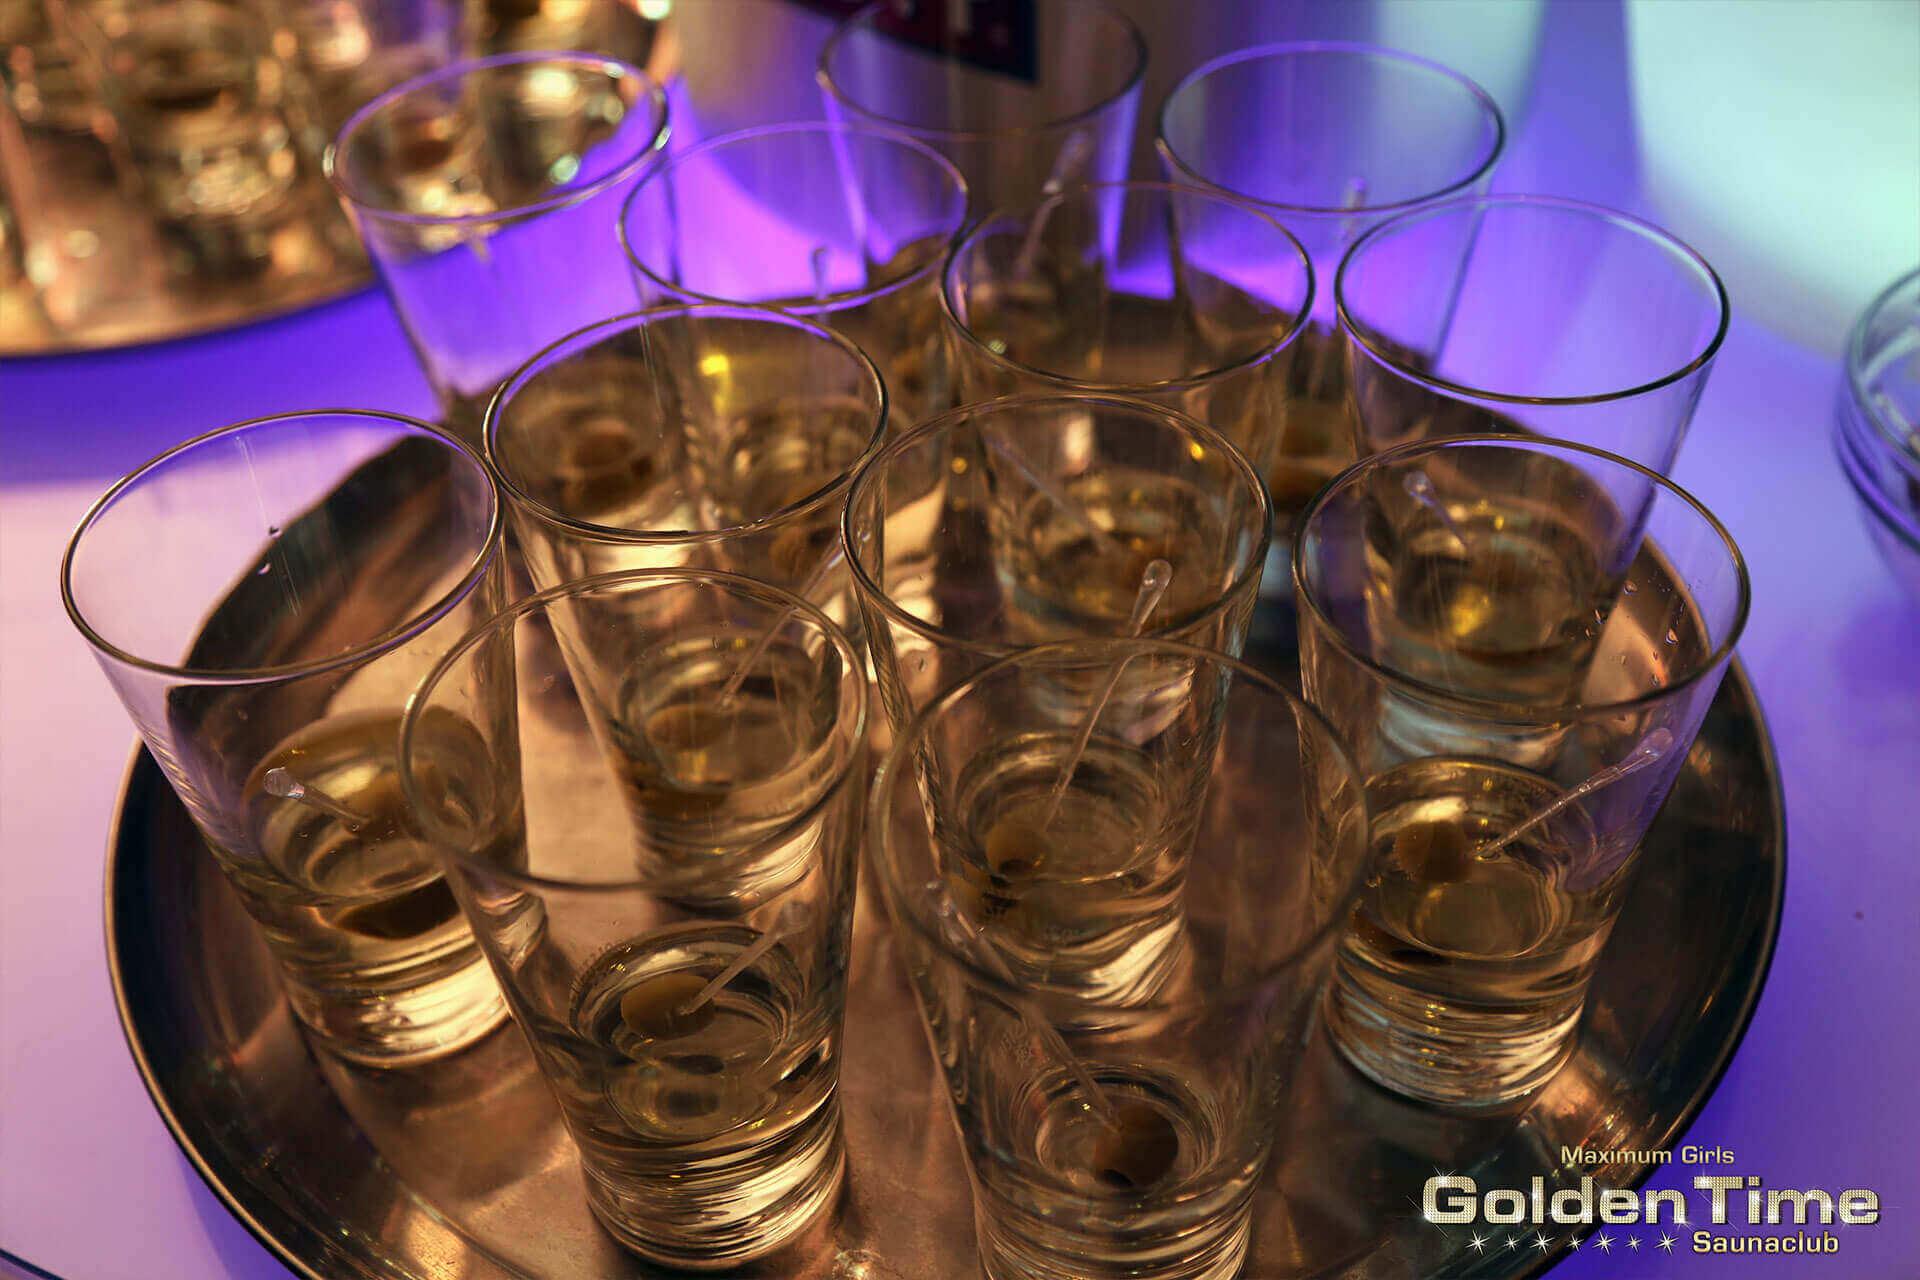 01-vatertag-pic-013-goldentime-saunaclub.jpg